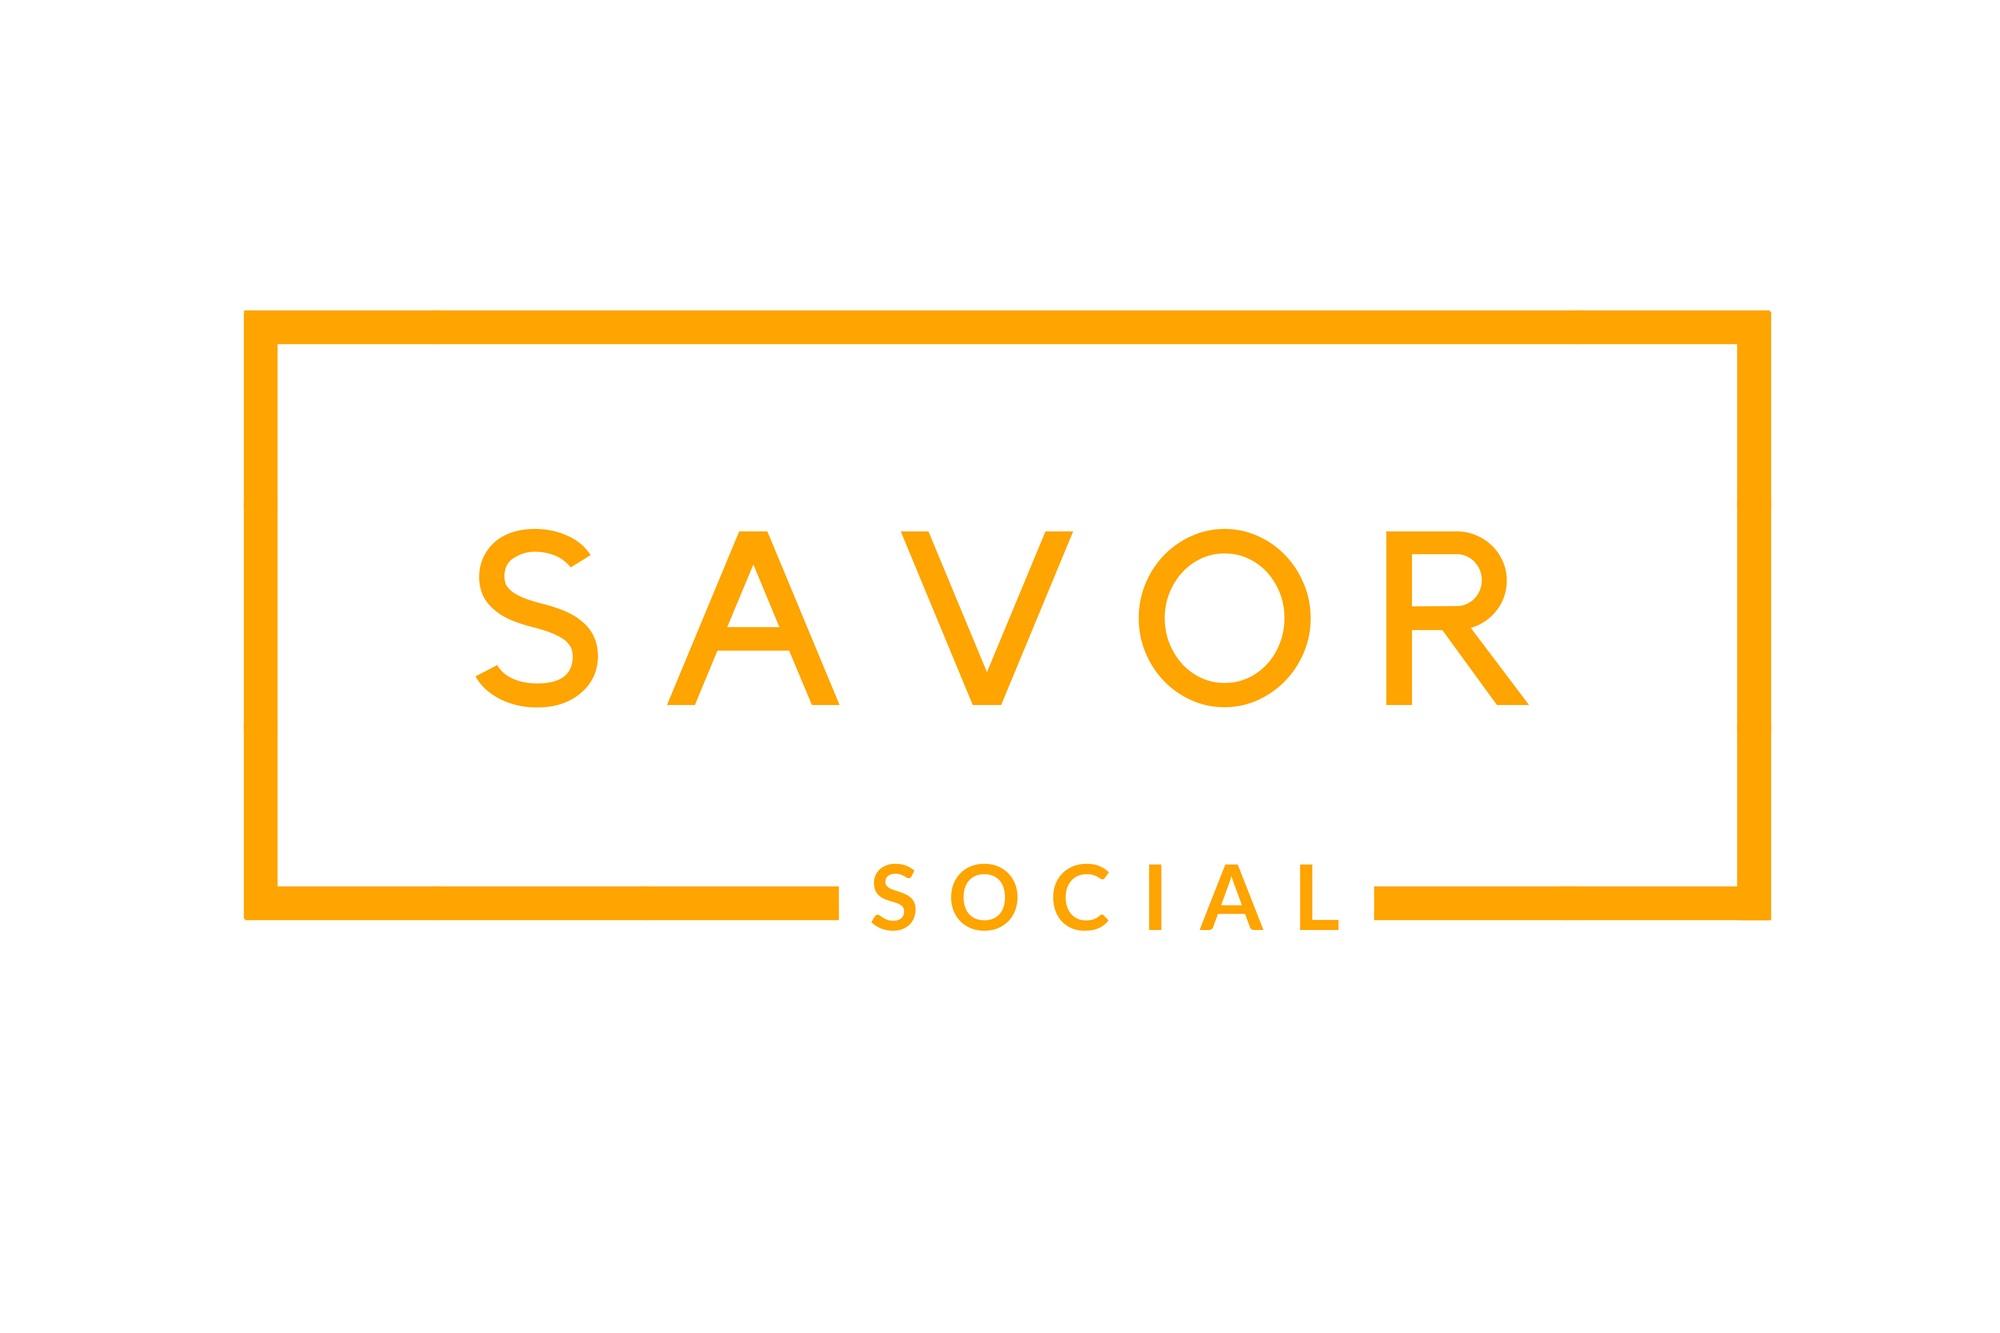 savor social